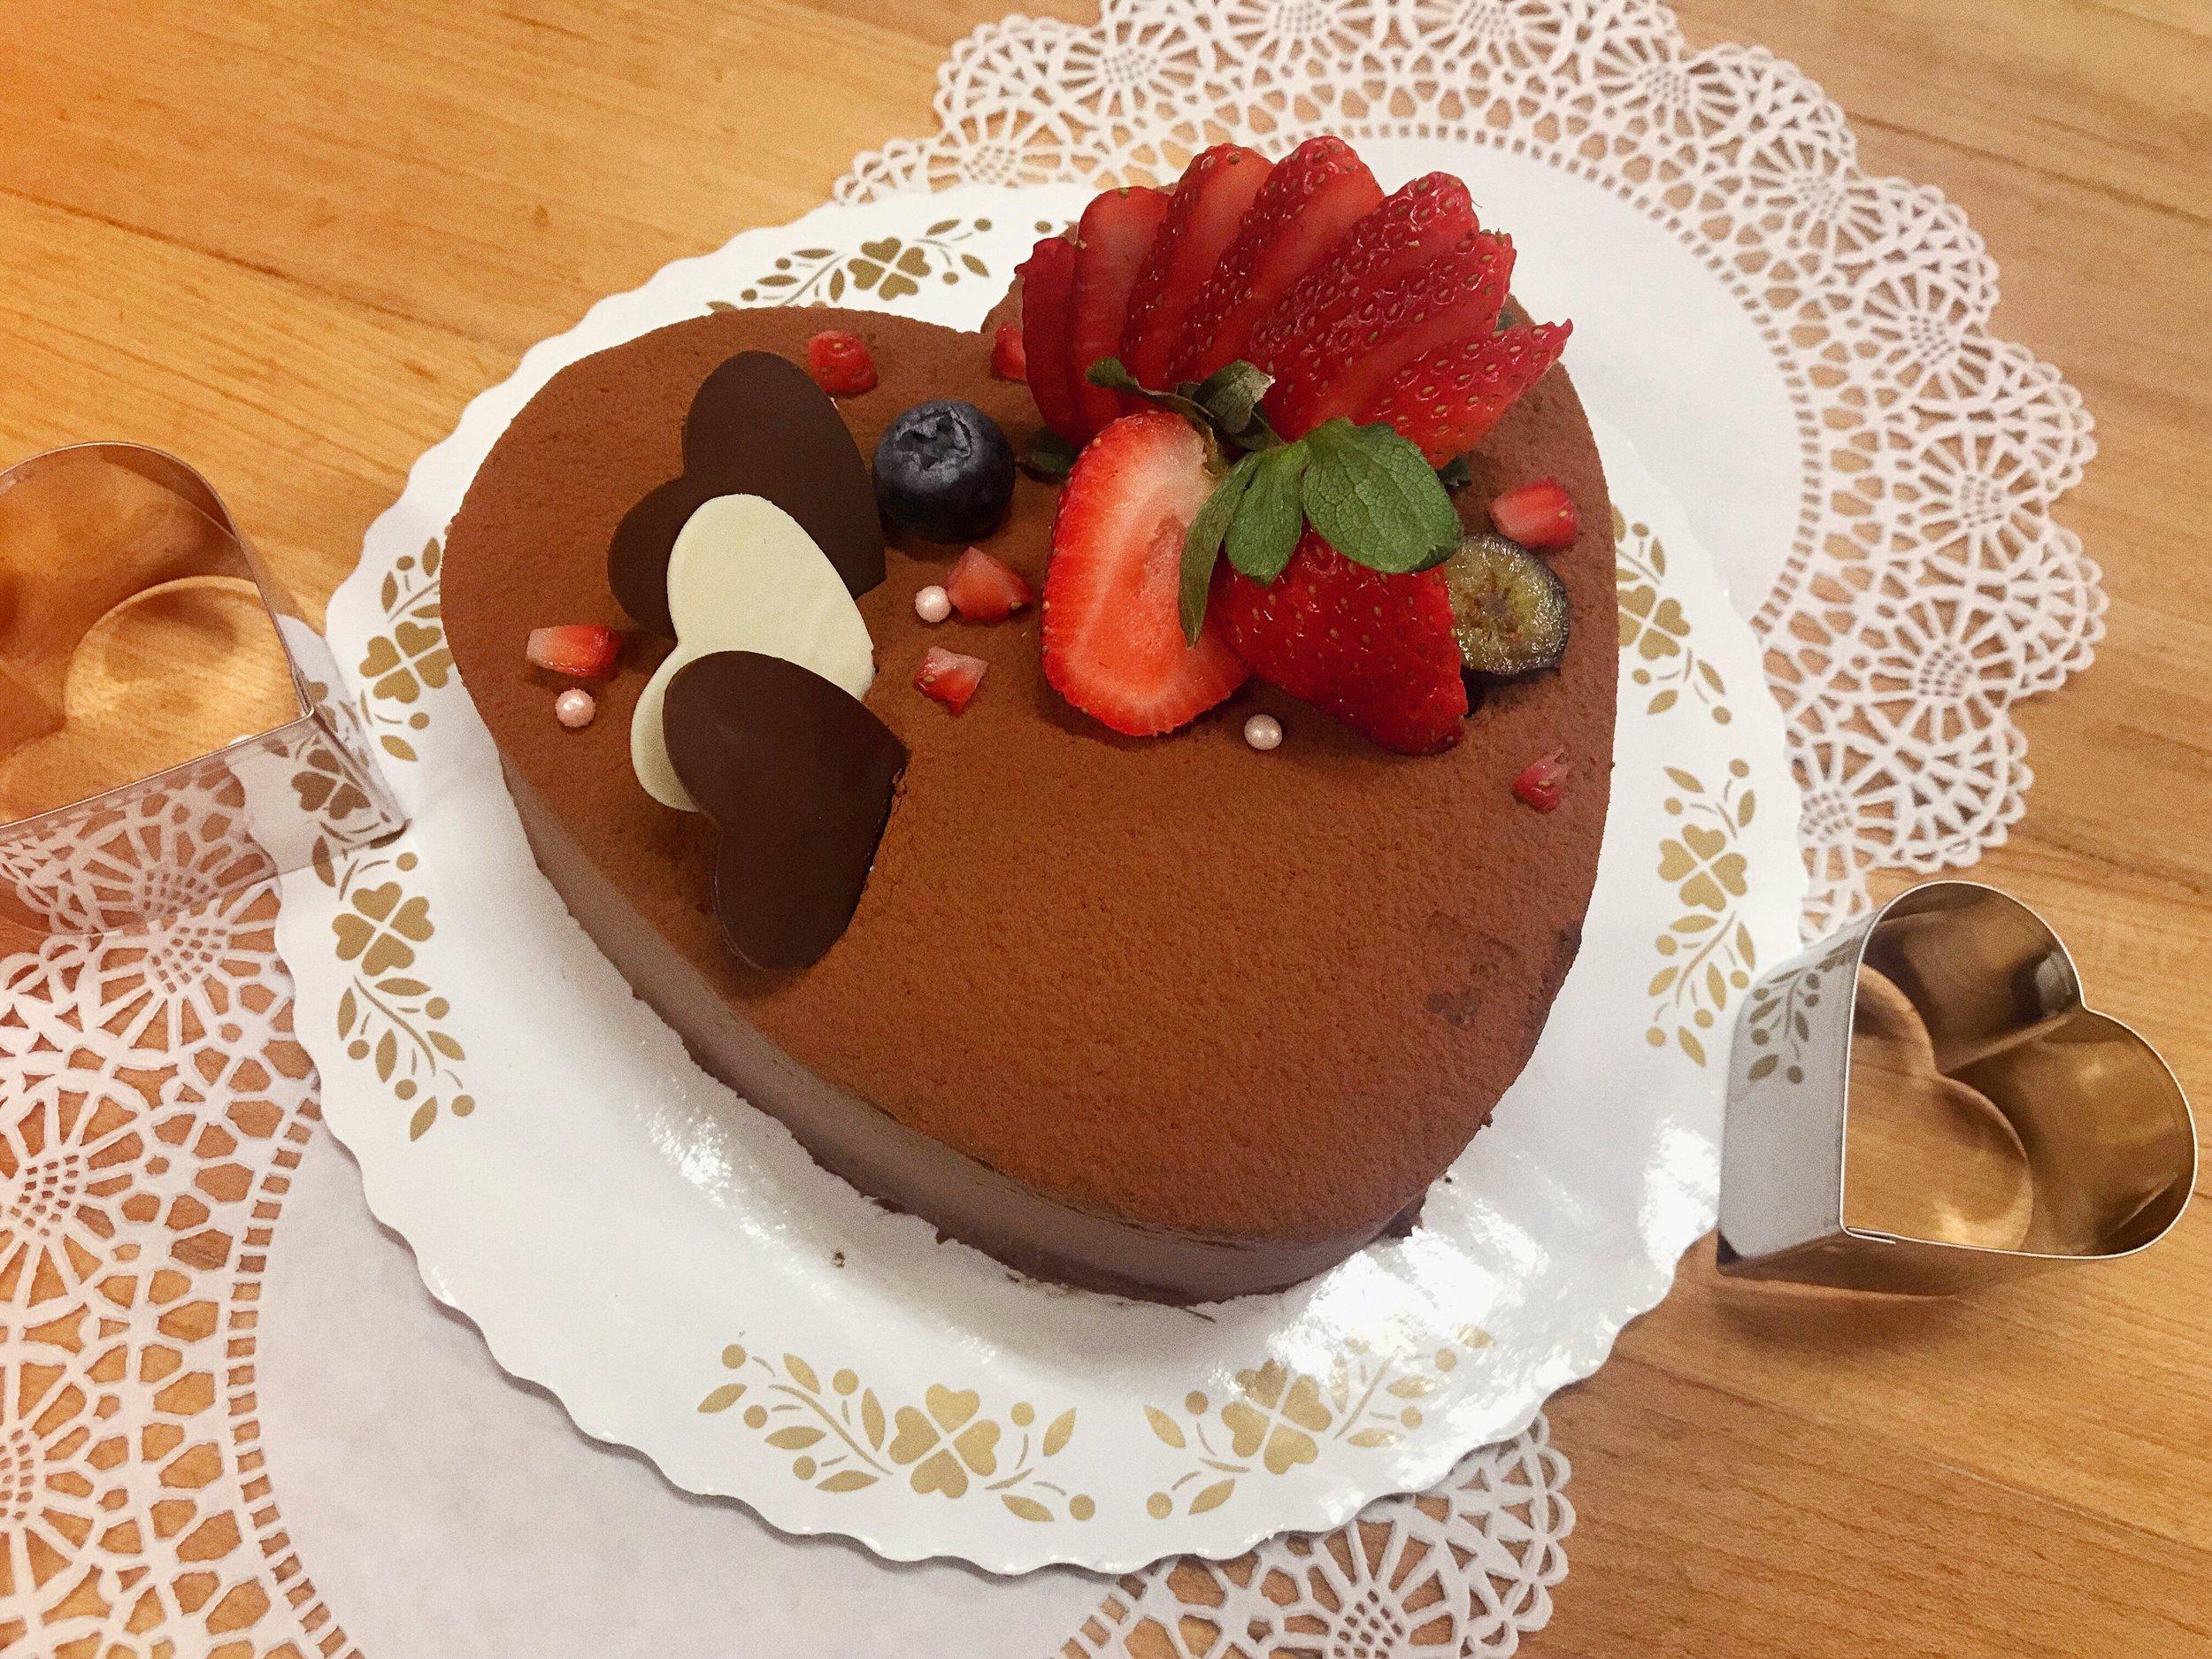 "Chocolate ""Queen"" Cake - Chocolate ""Queen"" Cake - For your majesty, a moist chocolate sponge cake filled with layers of silky chocolate cream and soft chocolate sponge, generously dusted with the finest cocoa powder and topped with handmade white & milk chocolate hearts and fresh berries! 👑♥️ A delicate dessert for any chocolate lover!チョコレート 「クイーン」ケーキ:チョコをふんだんに使用したケーキとなっております。こちらのスポンジにはベルギーチョコレートを使用し、その上にしっとりとしたチョコレートクリームを重ね合わせ、仕上げに滑らかな舌触りのココアパウダーをまぶした極上の逸品となっております。付け合せに手作りホワイトチョコのハートと季節のベリーを並べてります。それは狡猾で上品な舌触りですがその中でゆっくりと姿を現す繊細な甘さはまるで恋慕に浸る情炎な女王様を彷彿とさせる上品でしっとりしたチョコレートケーキとなっております。"